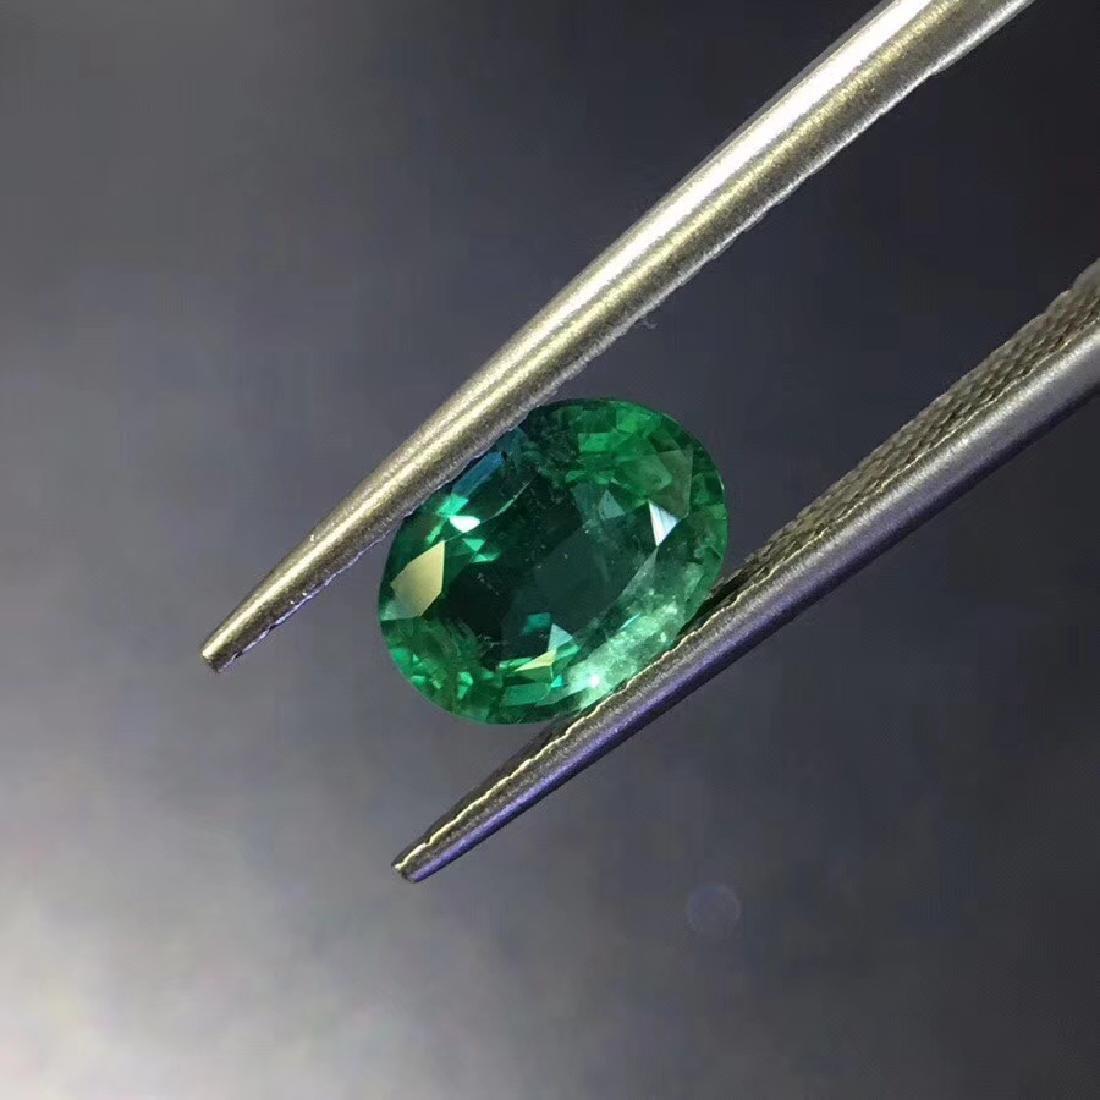 1.28 ct Emerald 6.0*8.1 mm Oval Cut - 3